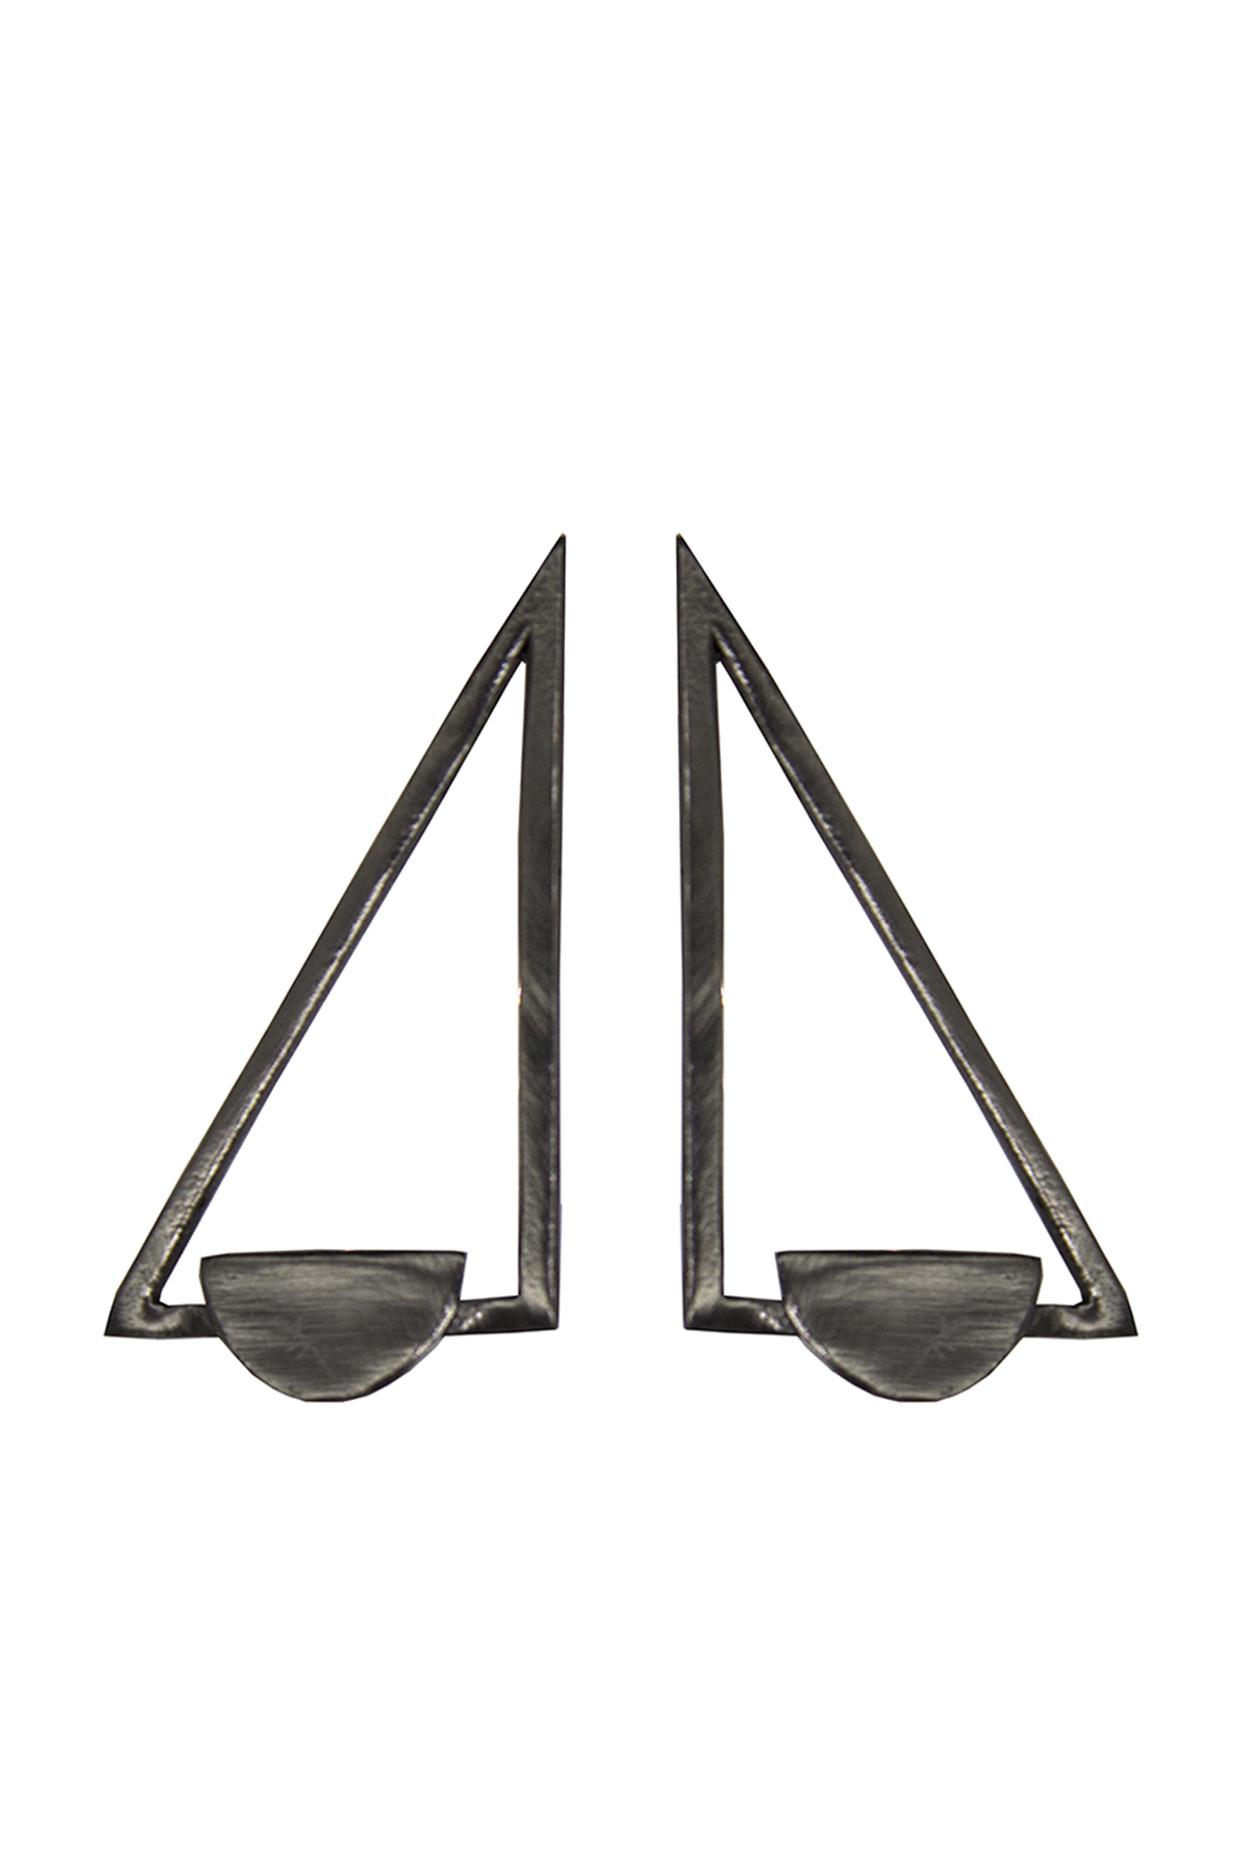 Handcrafted Brass Triangle Earrings In Black by Toorya